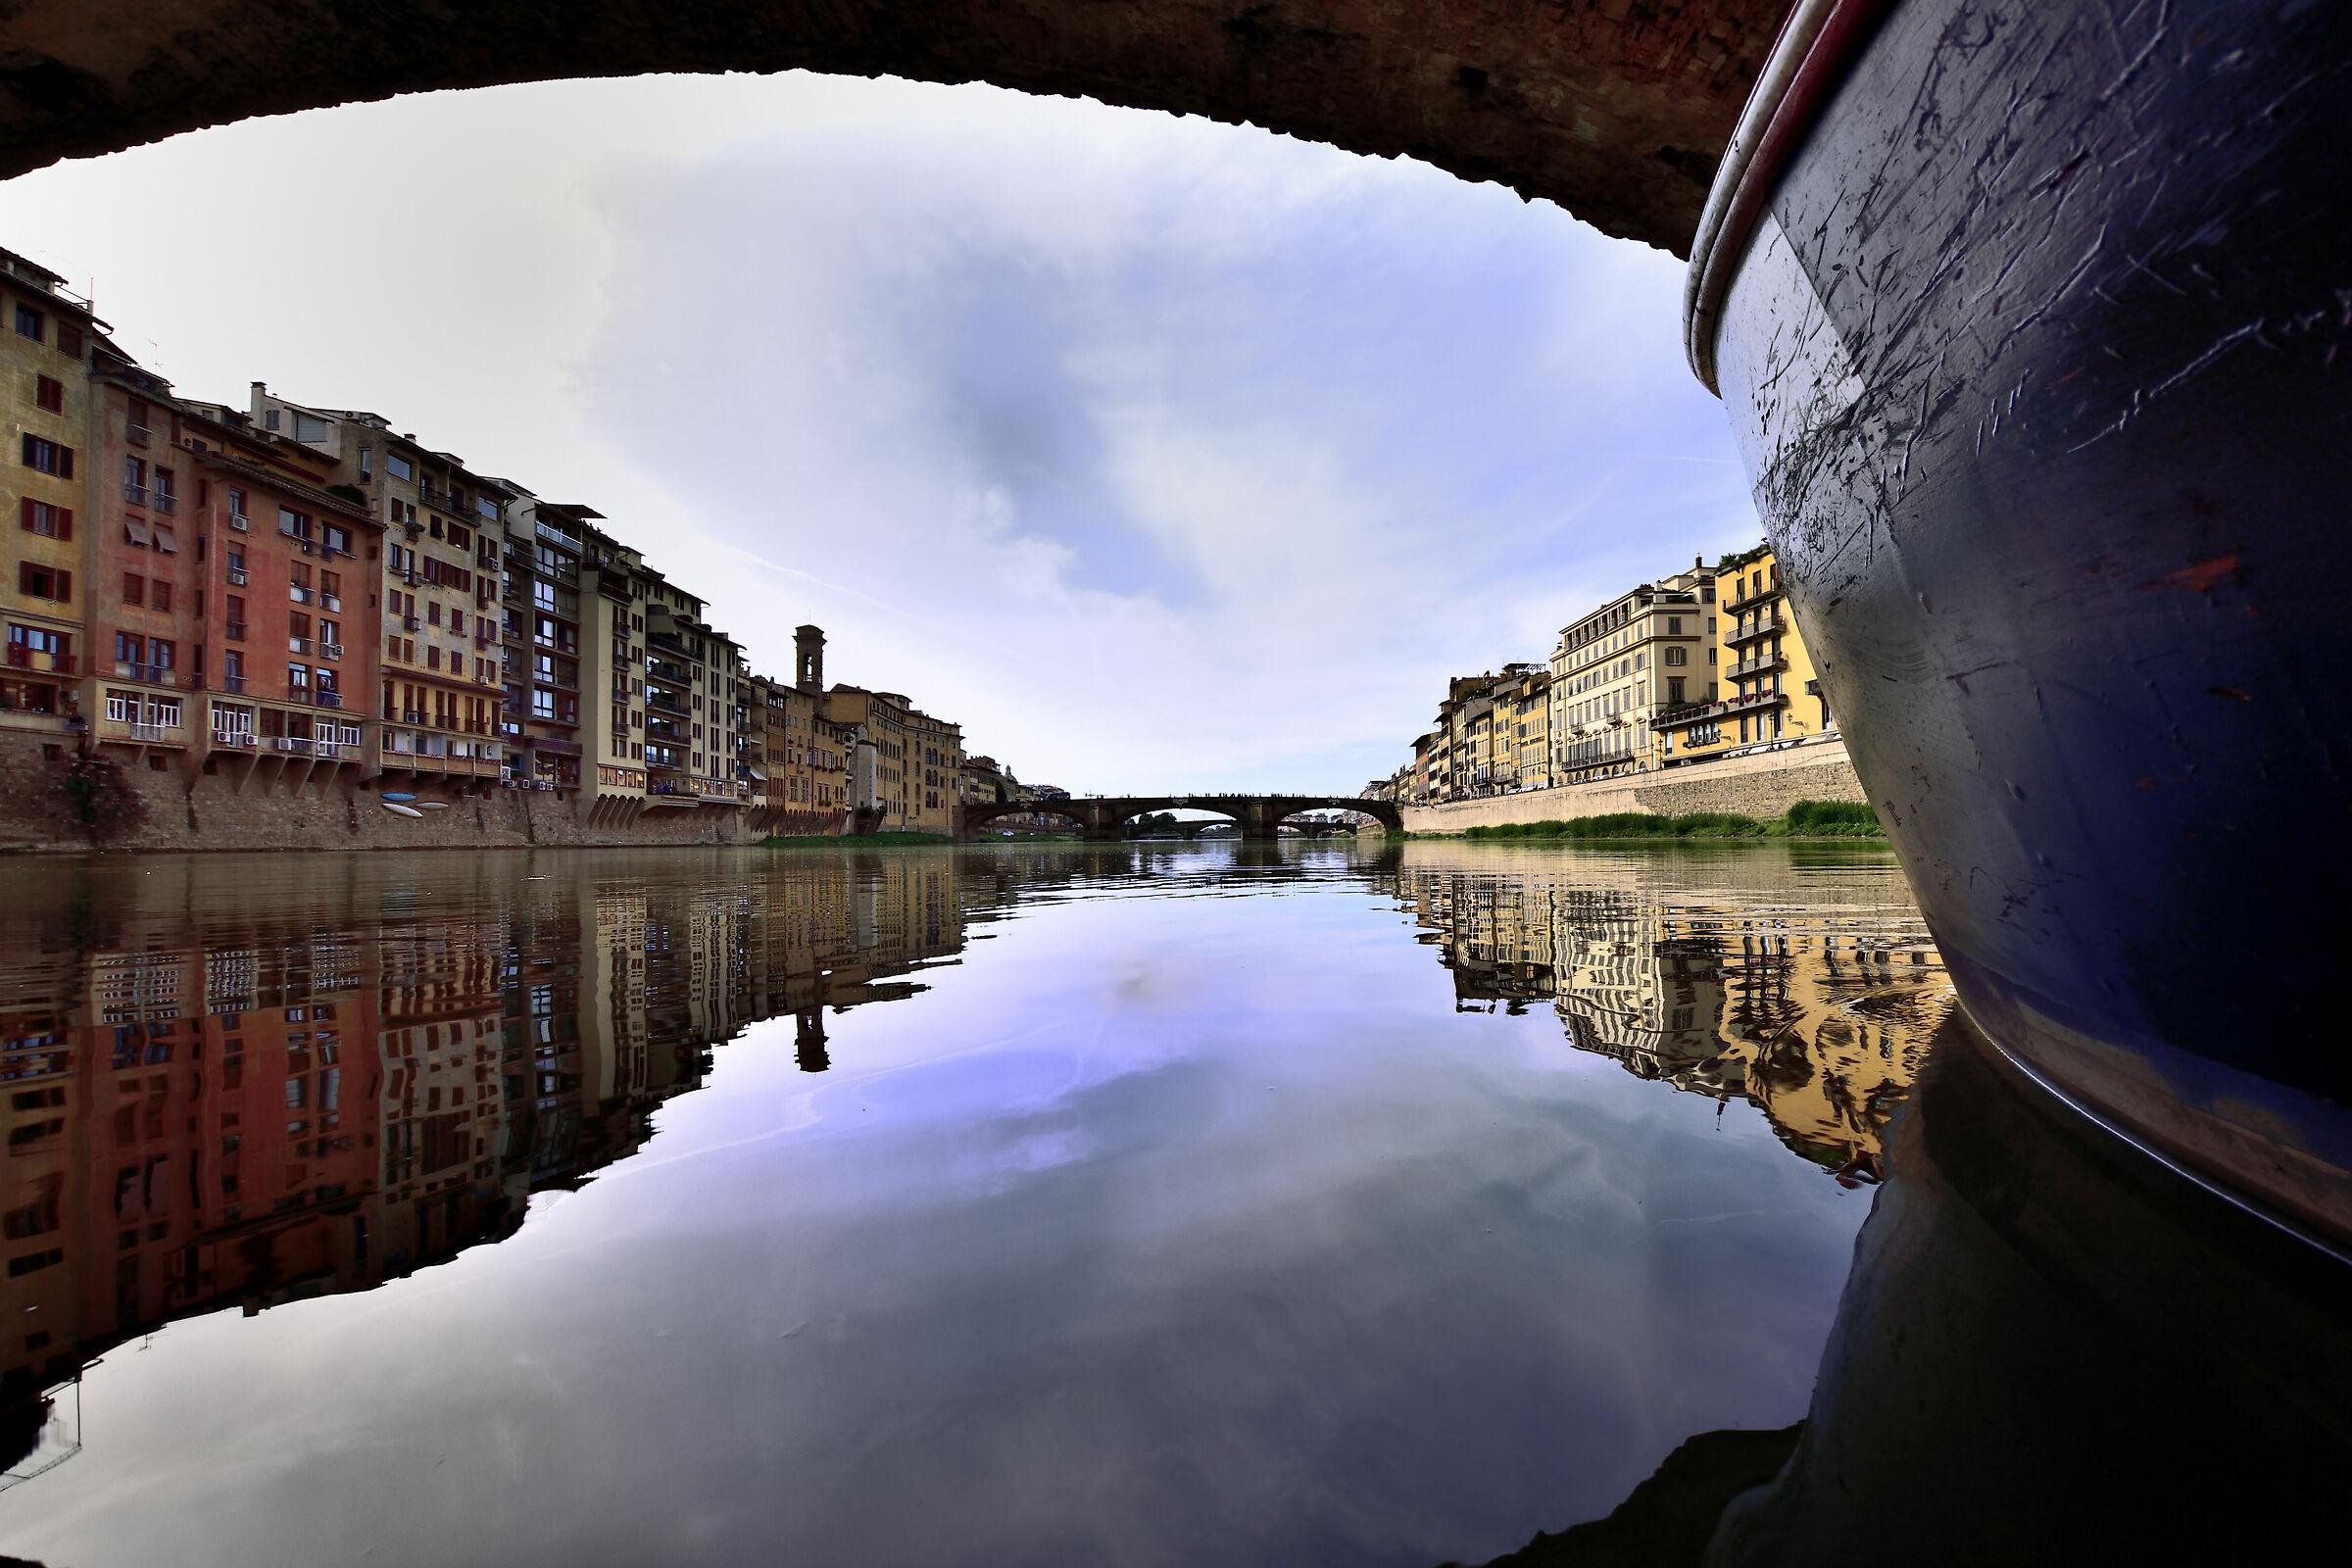 Under the Old Bridge...